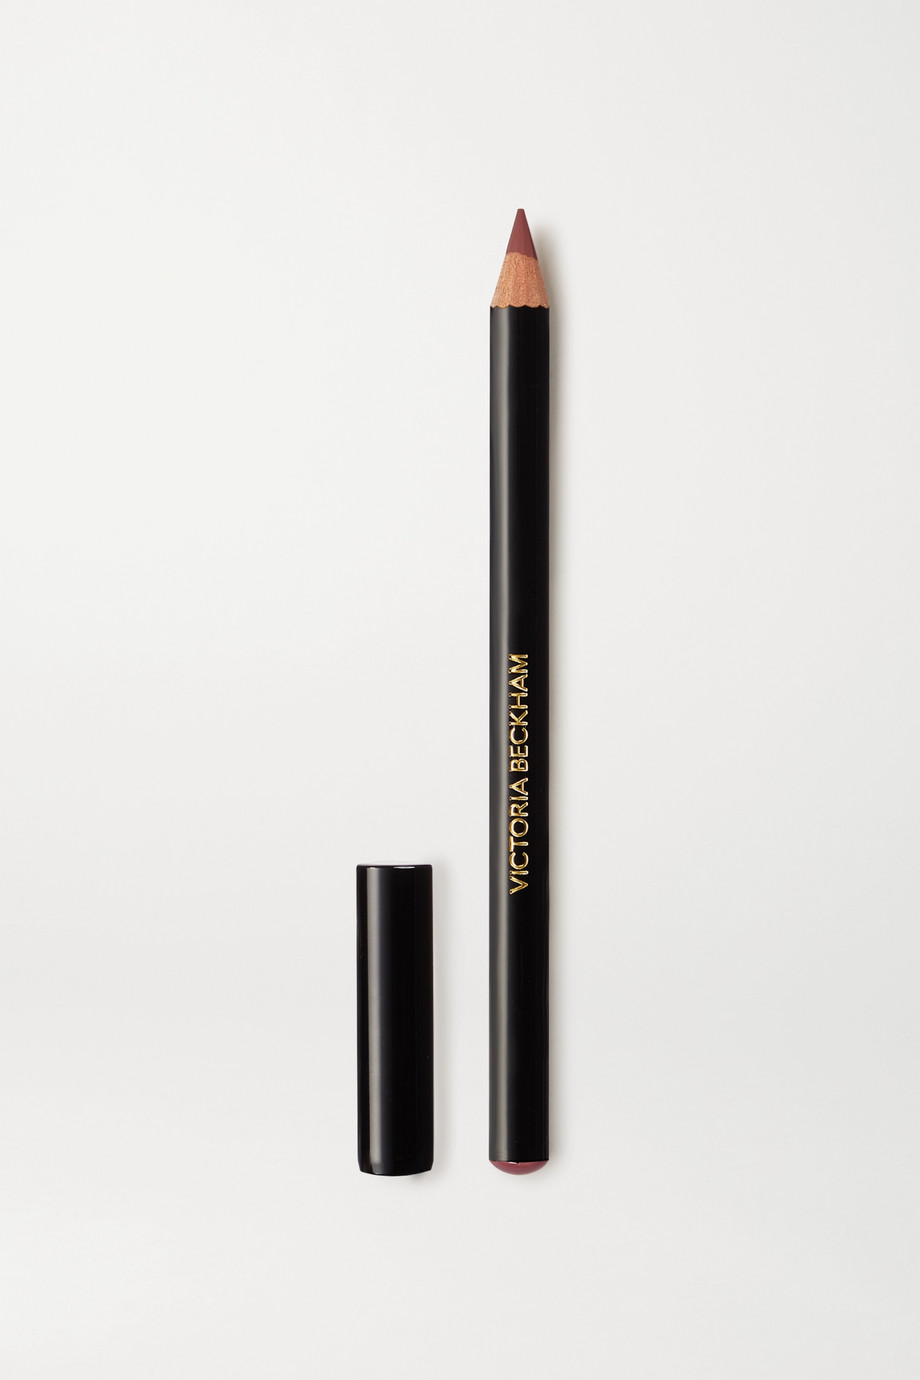 Victoria Beckham Beauty Lip Definer - 04